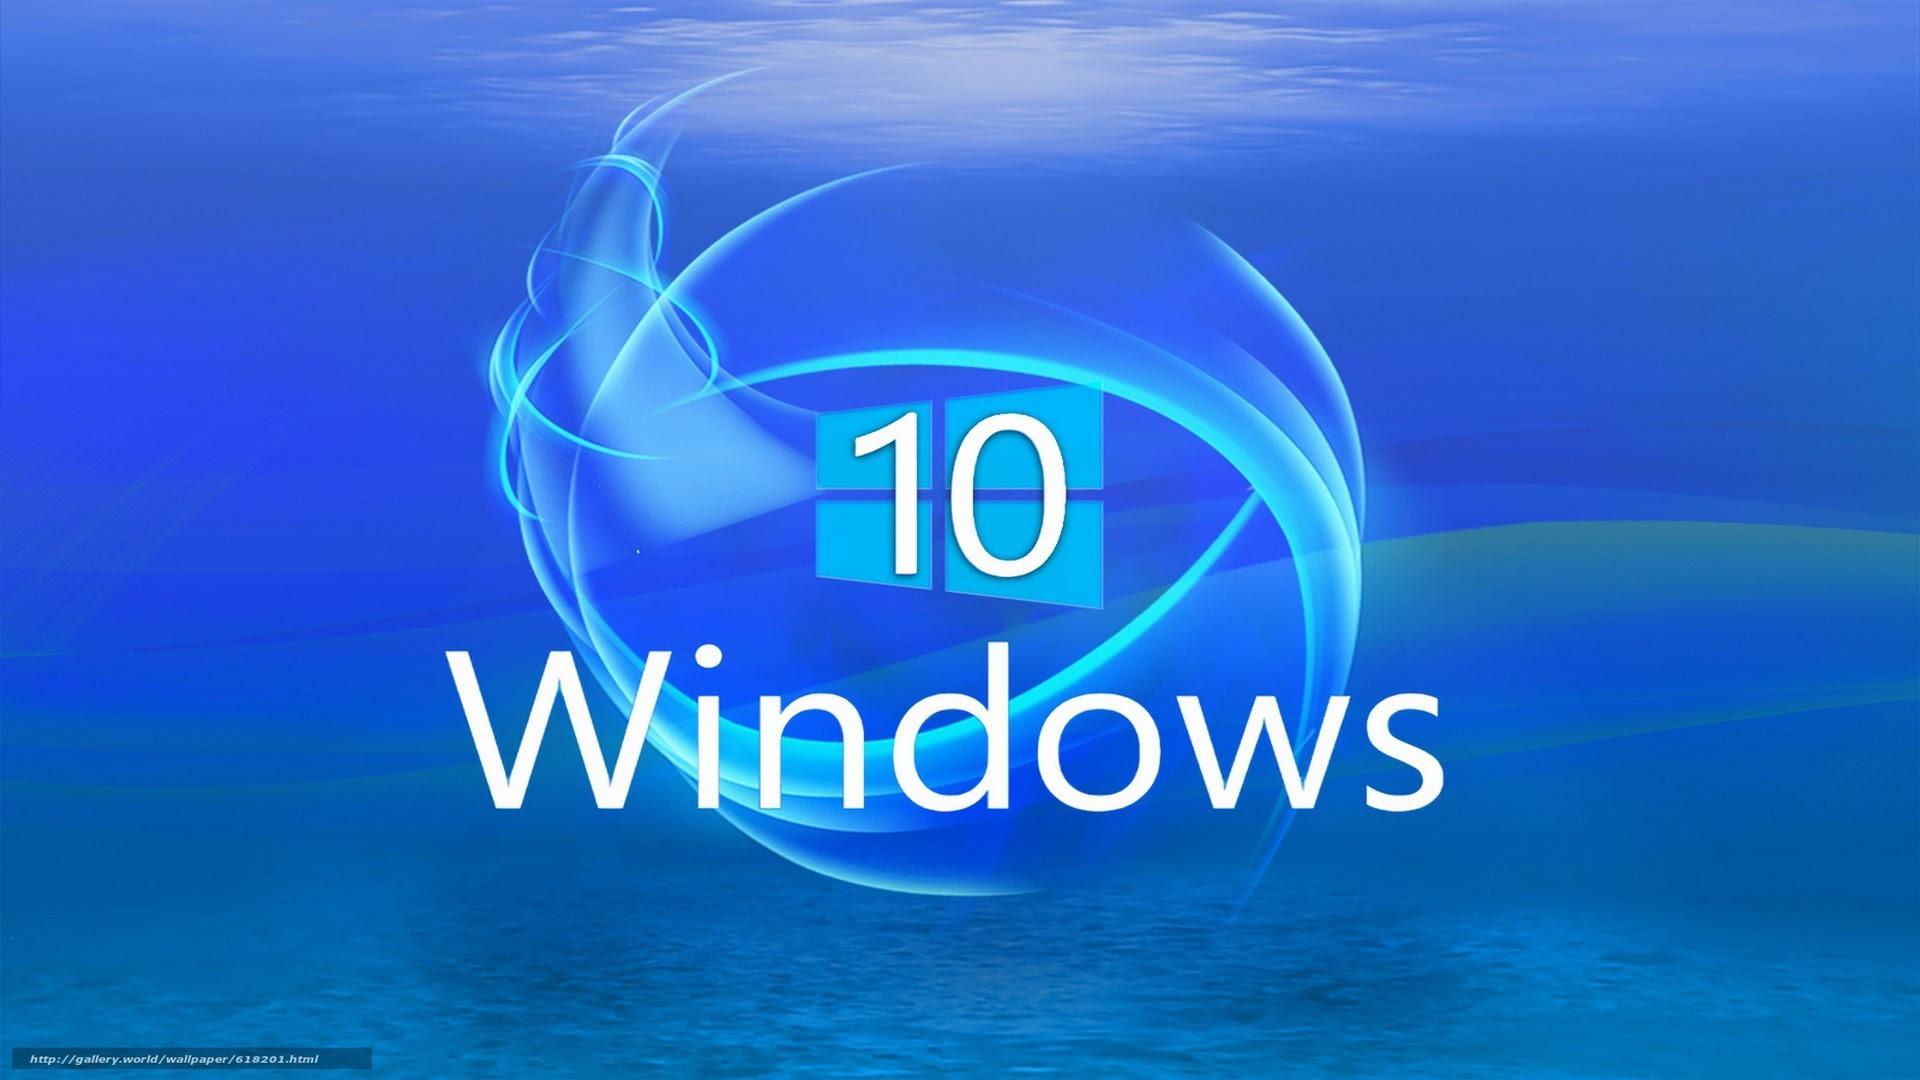 Windows 10 Hero Wallpaper HD (70+ images)